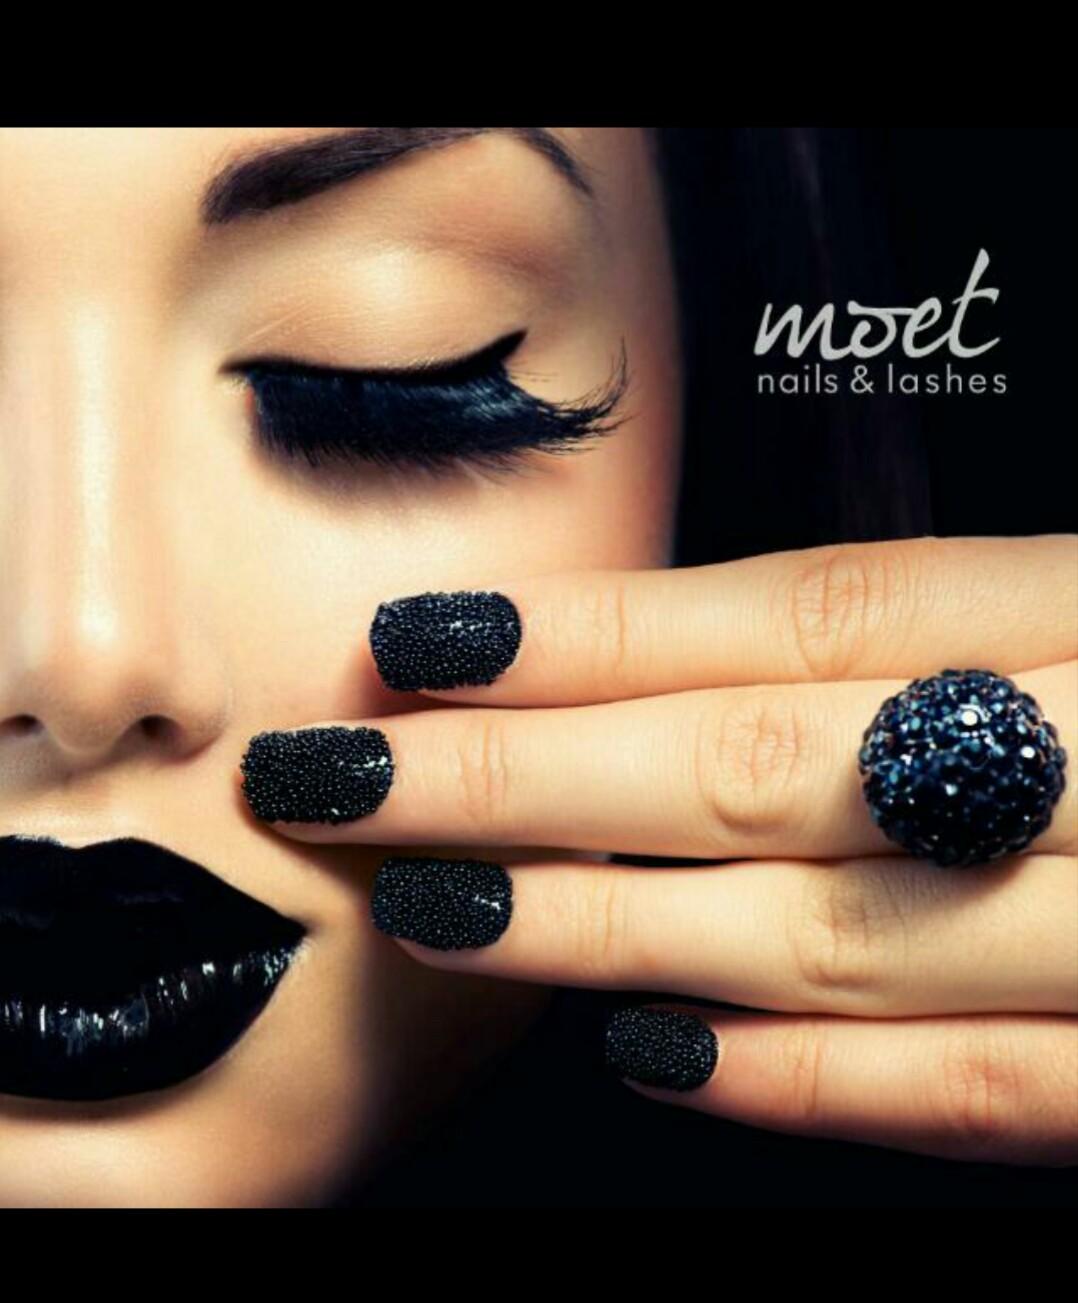 Moet Nails&Lashes